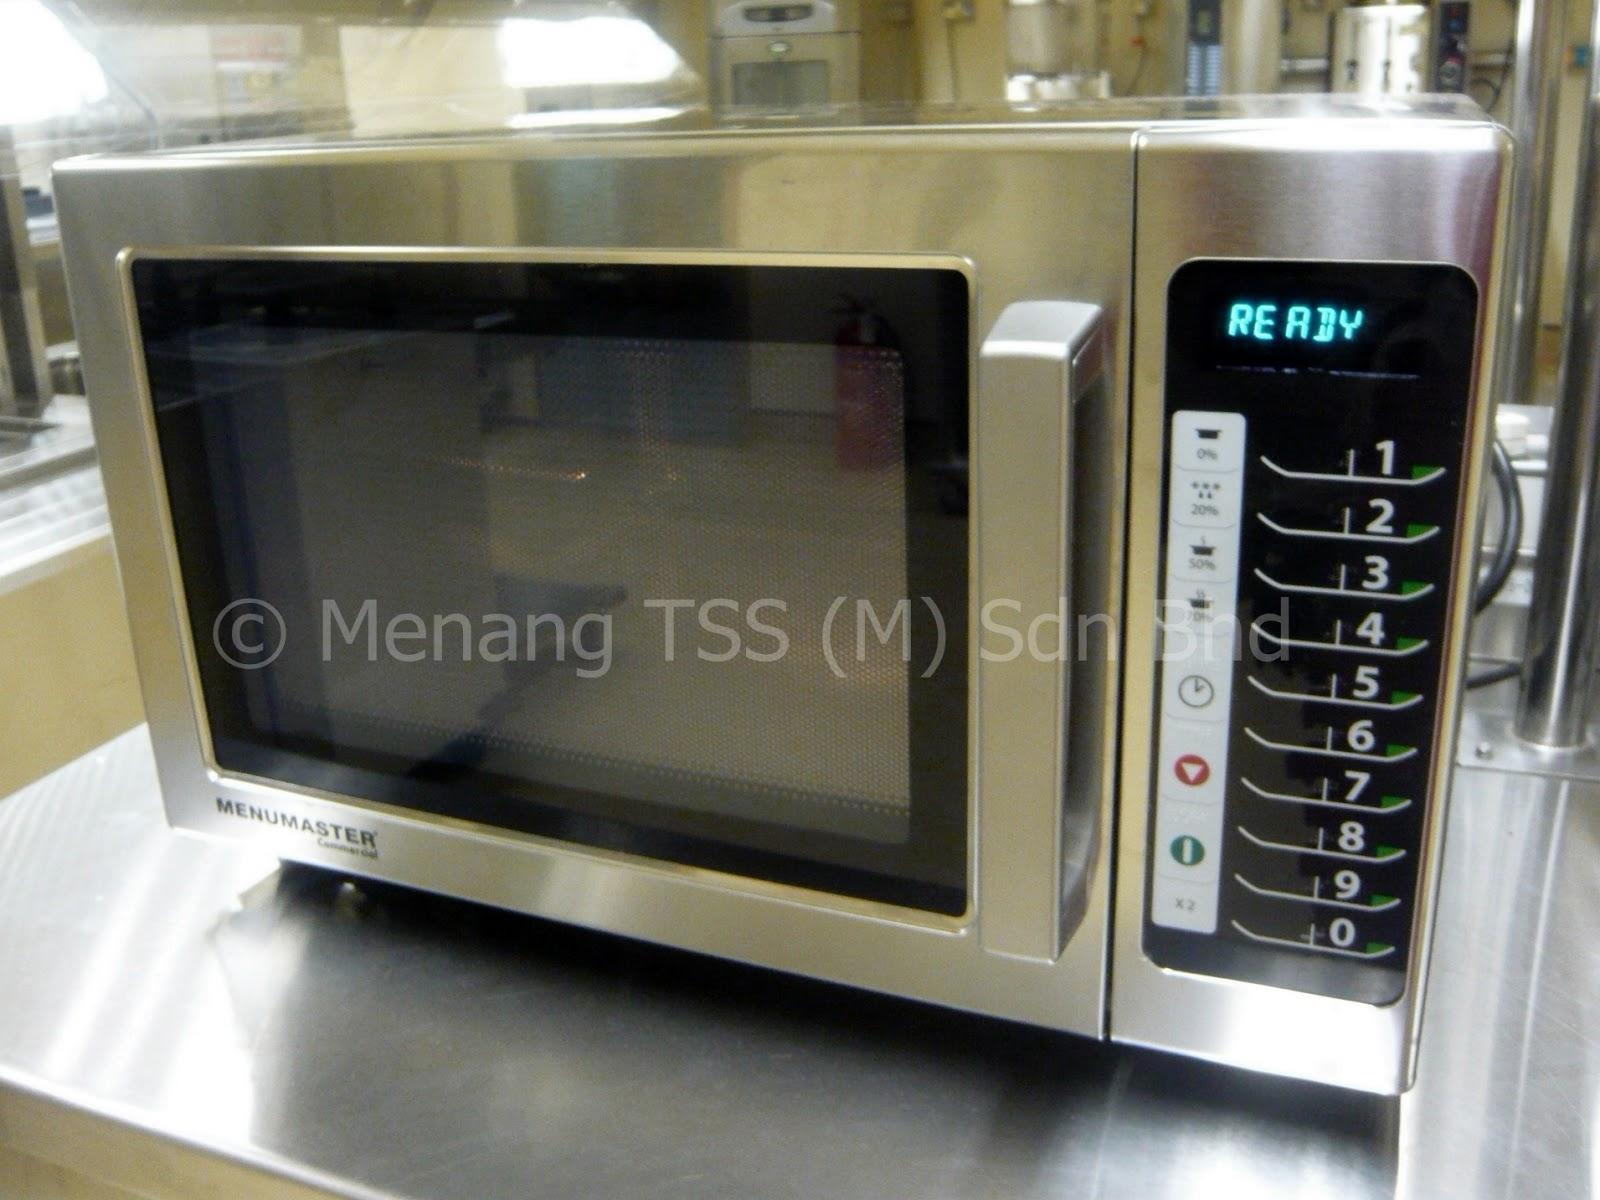 Menang tss m sdn bhd - Commercial kitchen appliance ...